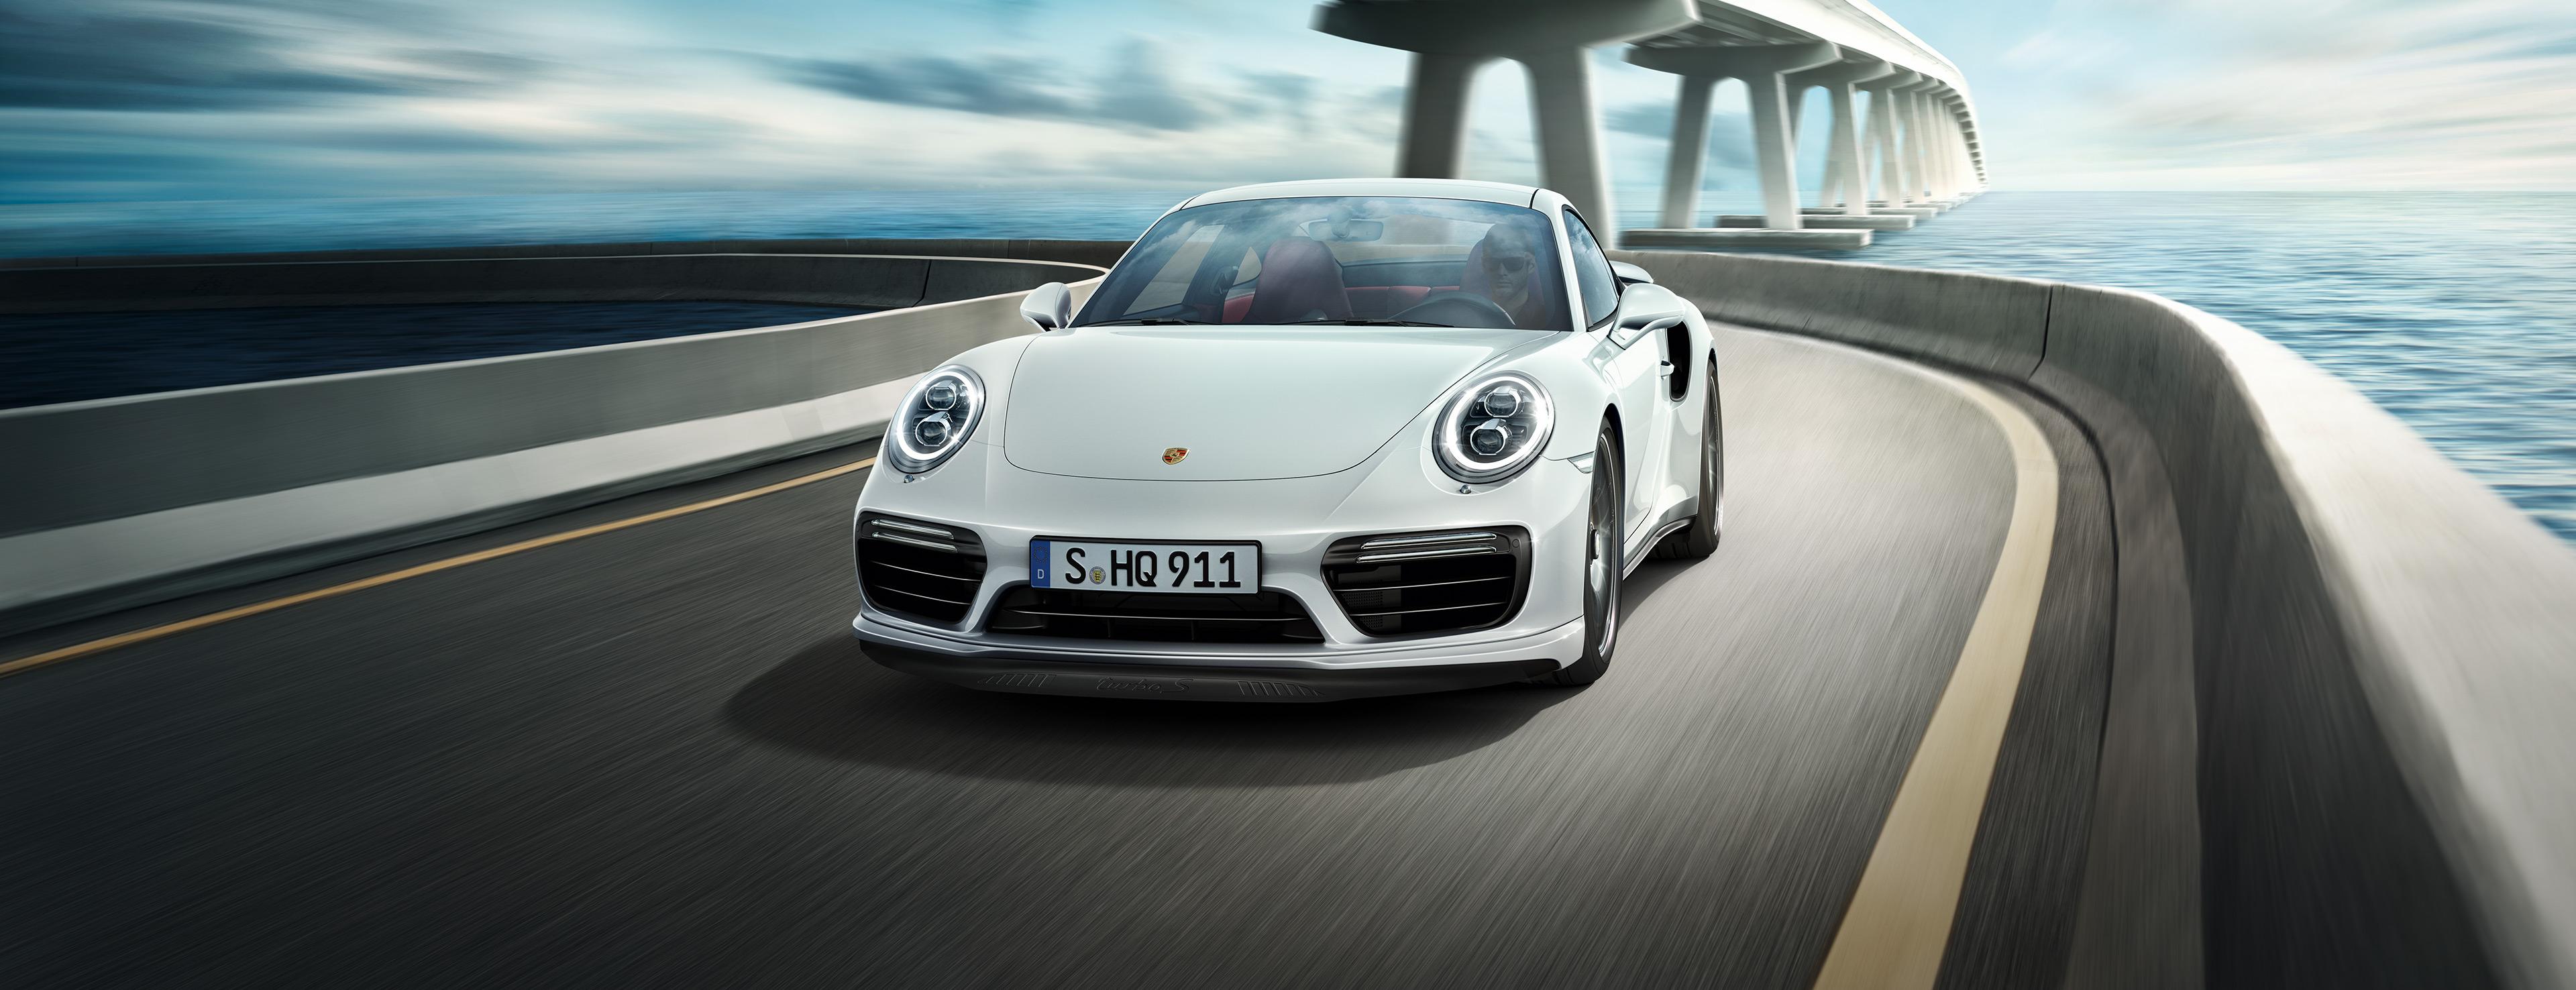 porsche 911 turbo models porsche usa